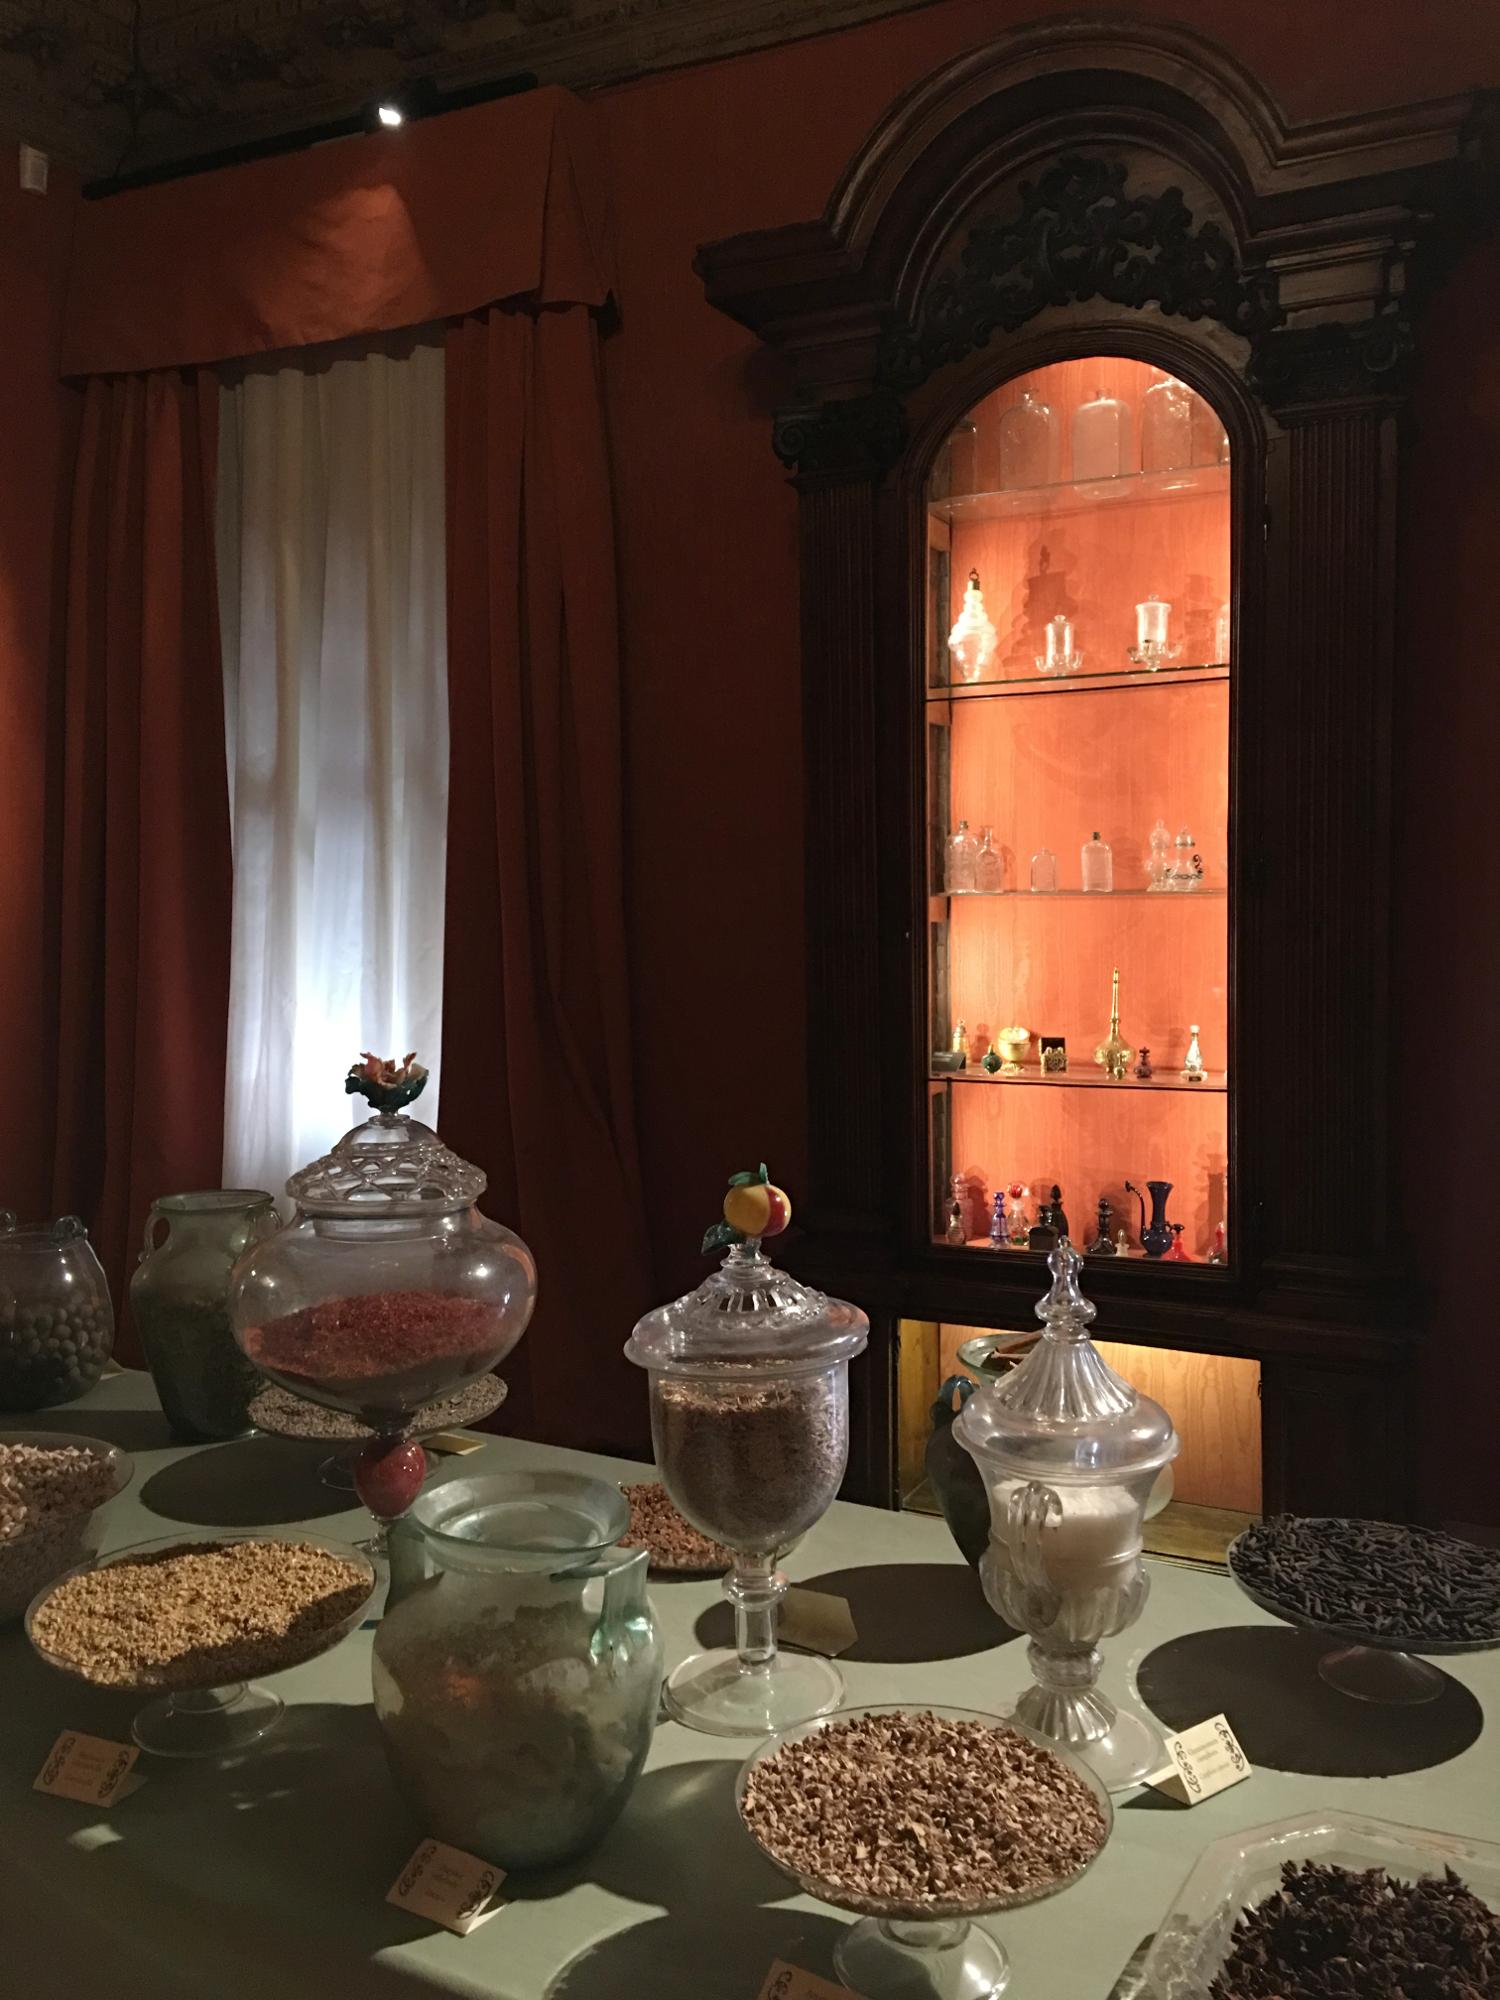 rocaille-blog-venezia-palazzo-mocenigo-percorso-profumo-mavive-vidal-56